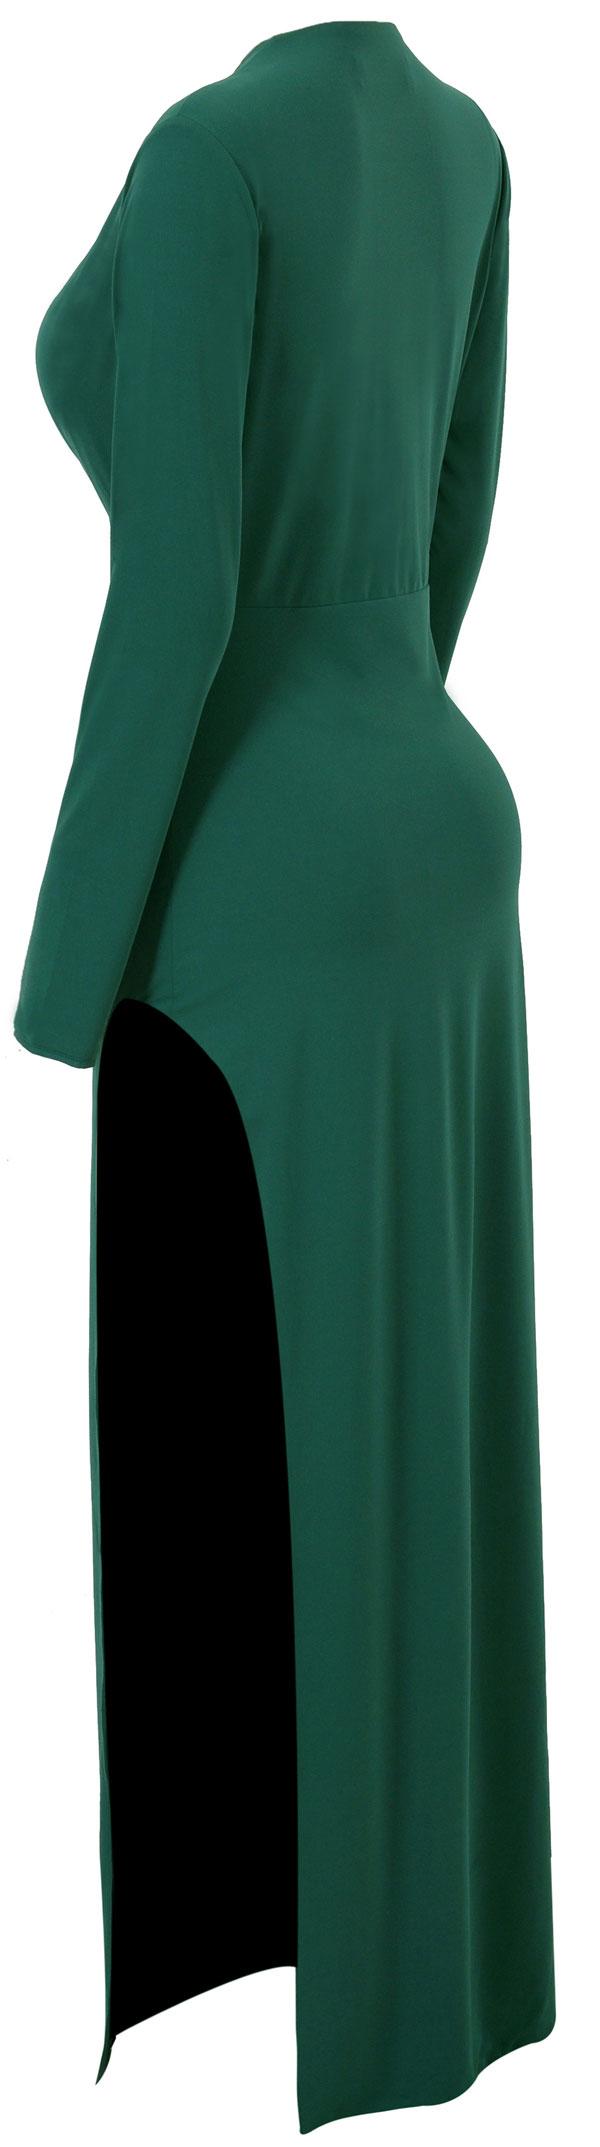 Clothing maxi dresses urileyu evergreen deep v double thigh